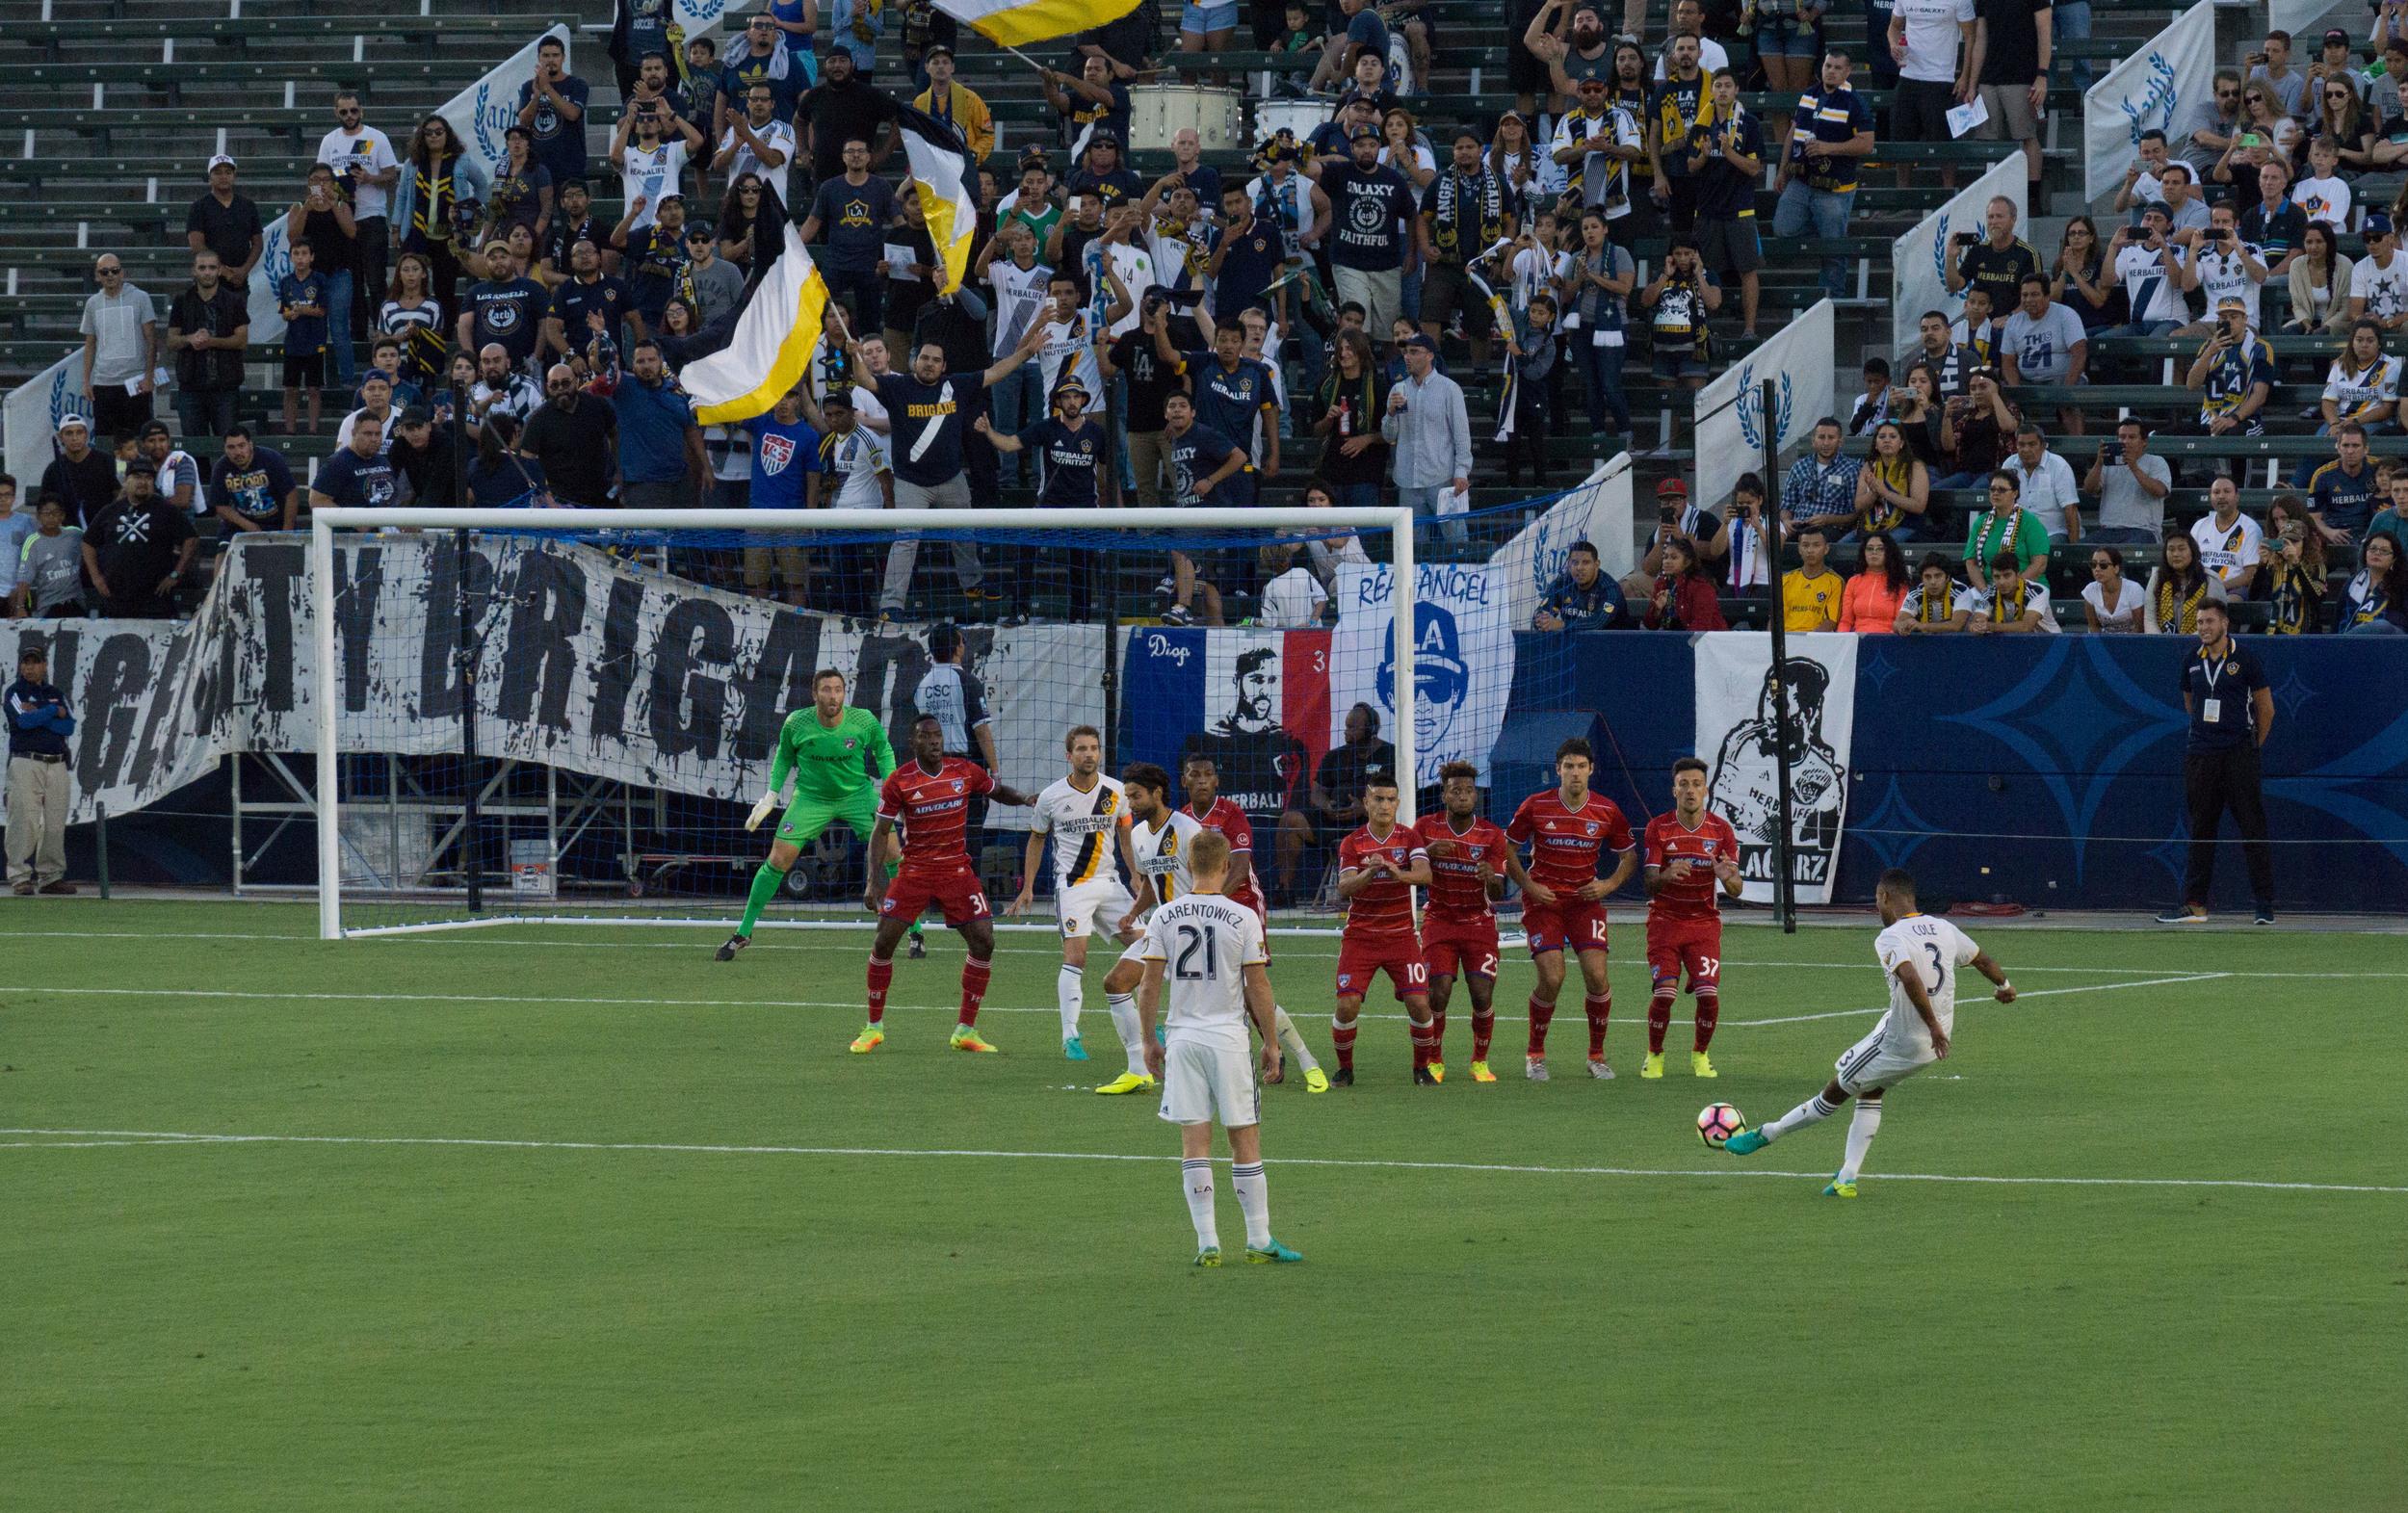 LA Galaxy - Ashley Cole Free Kick